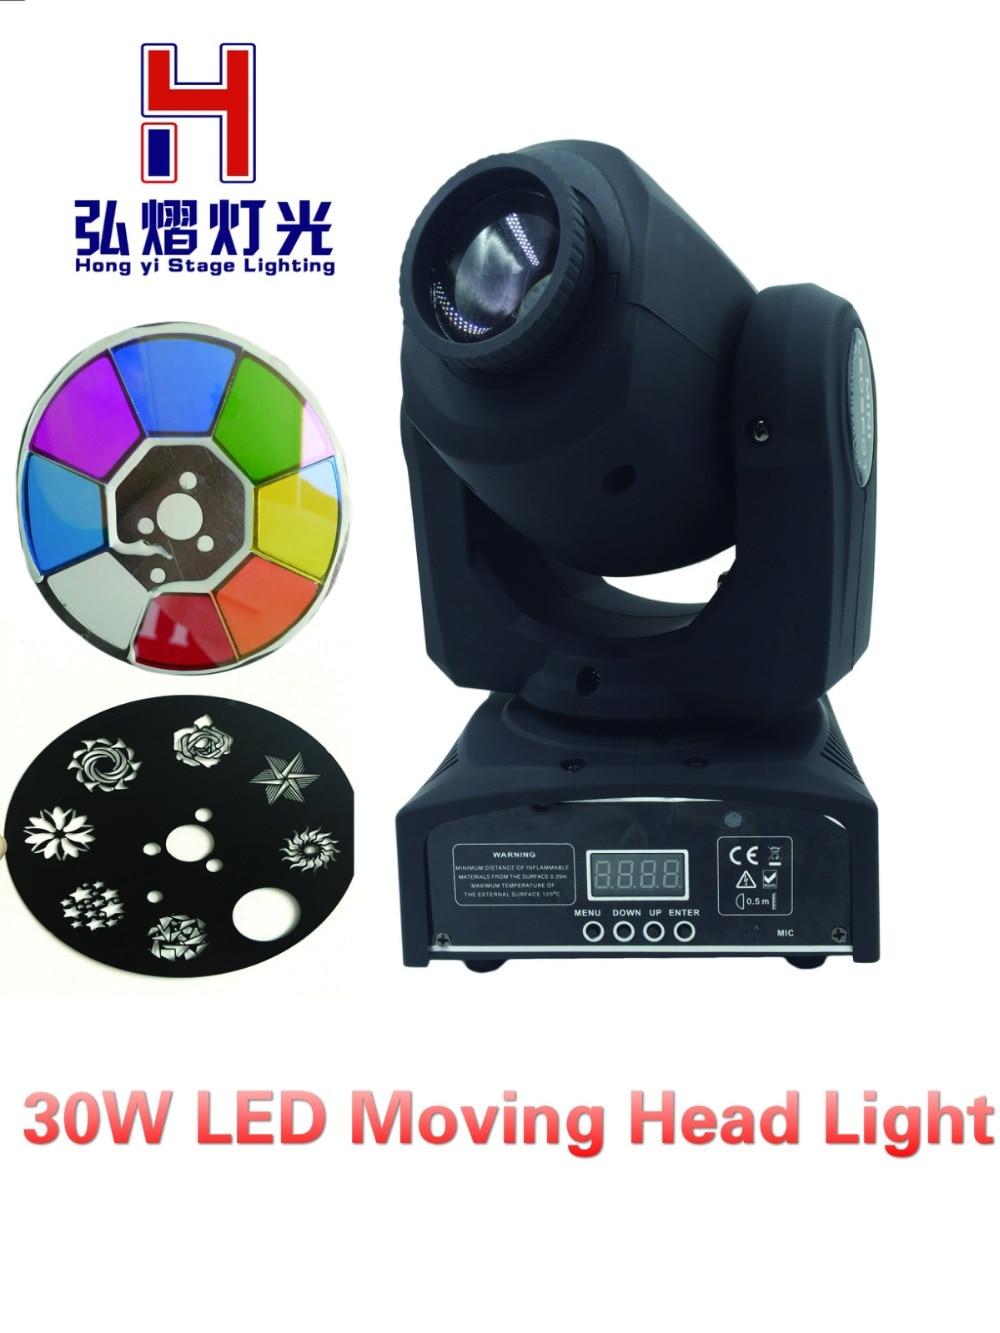 2016 hot LED Light moving head pocket sport mini lamp 30W DMX 512 dj 8 gobos & 8 color 11ch effect stage lights effect sport дсб т45 бп45